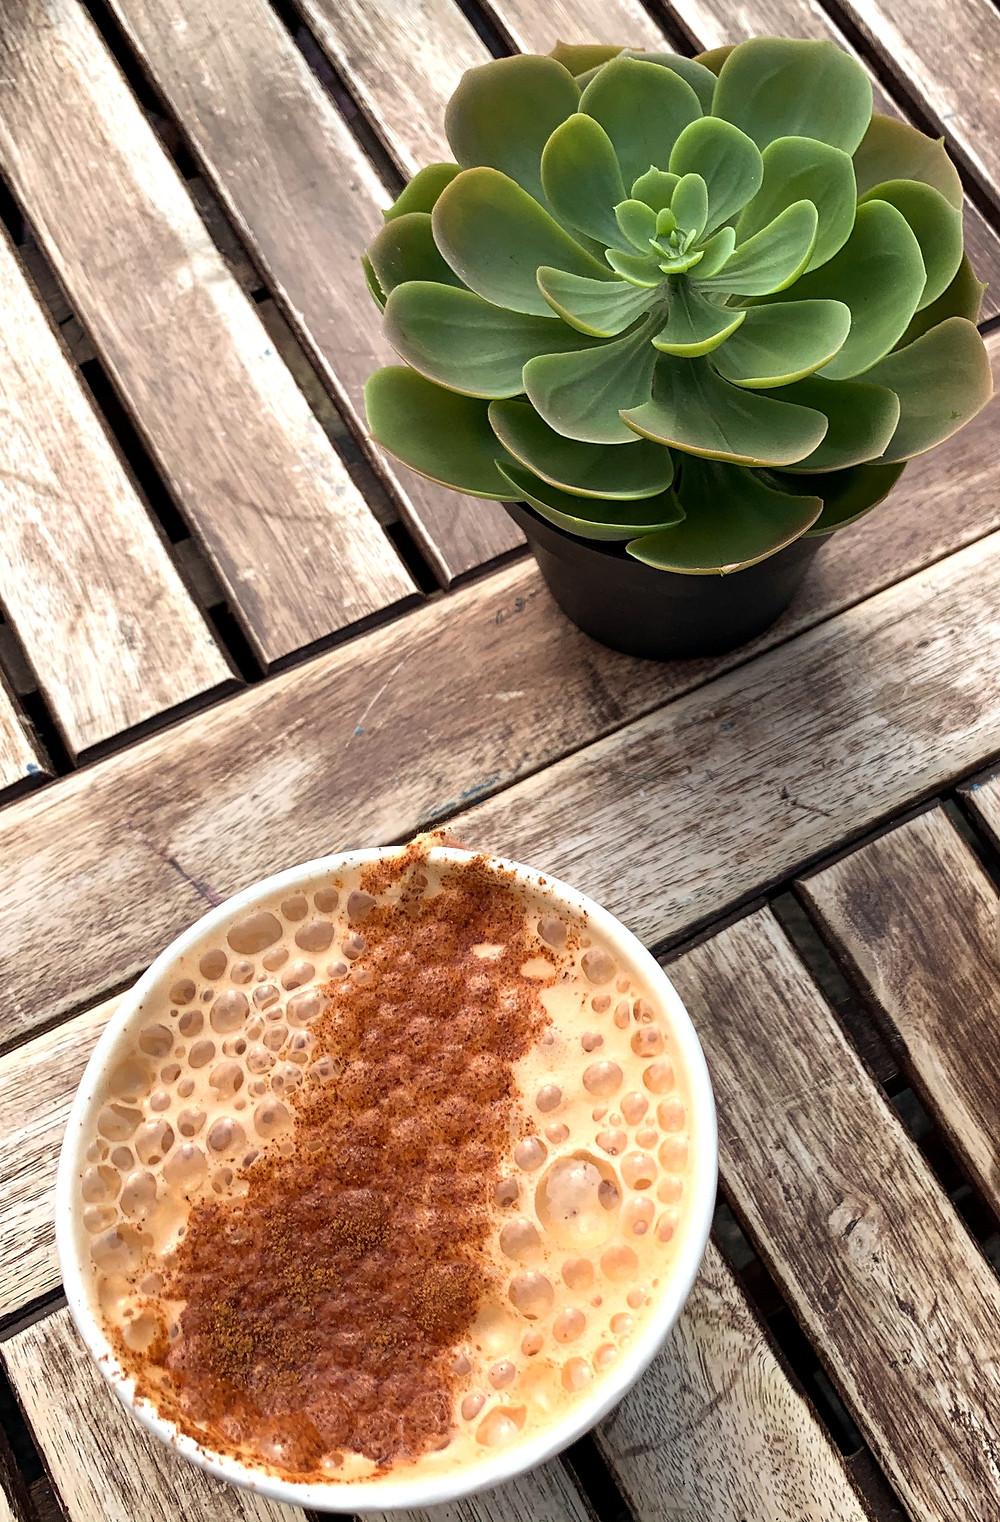 Film Cafe Tea Latte Best in Toronto Kensington Market